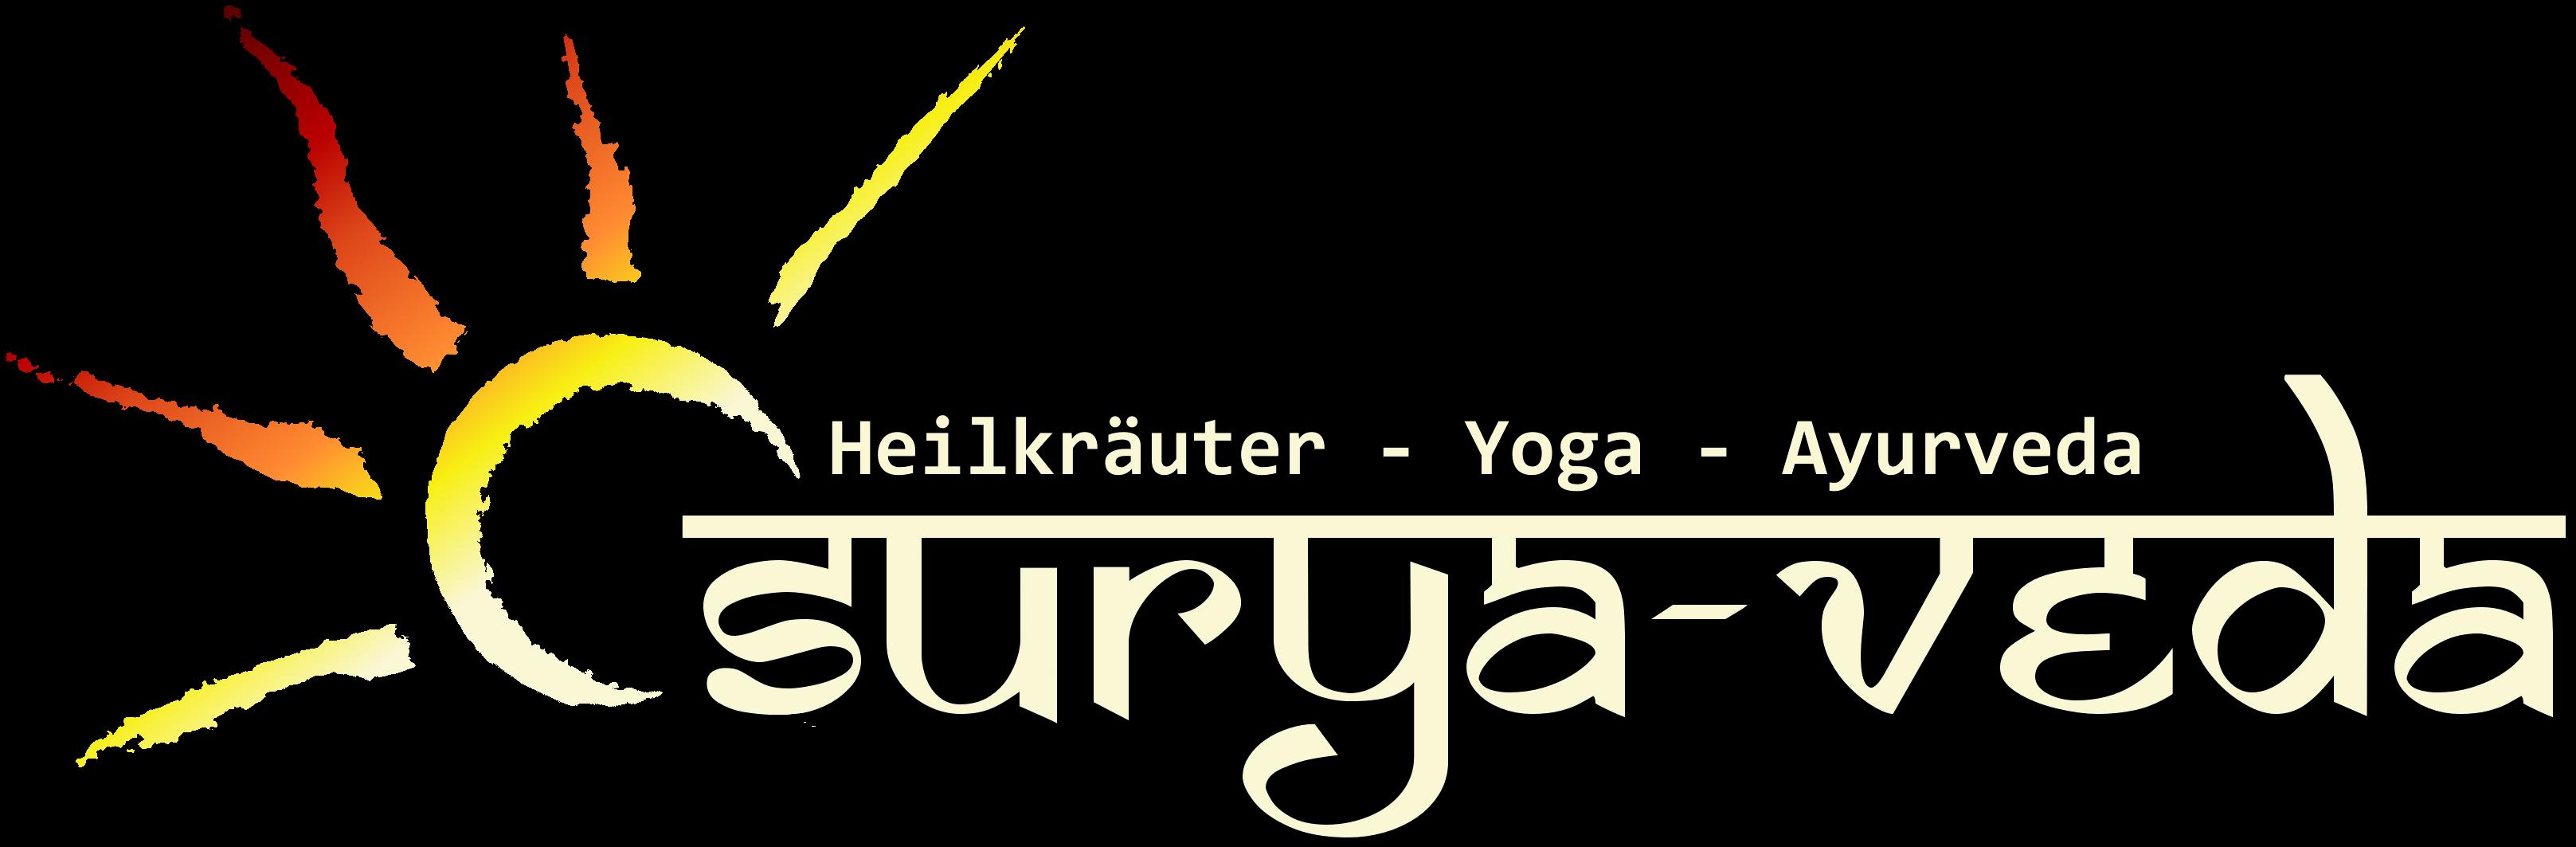 Surya-Veda